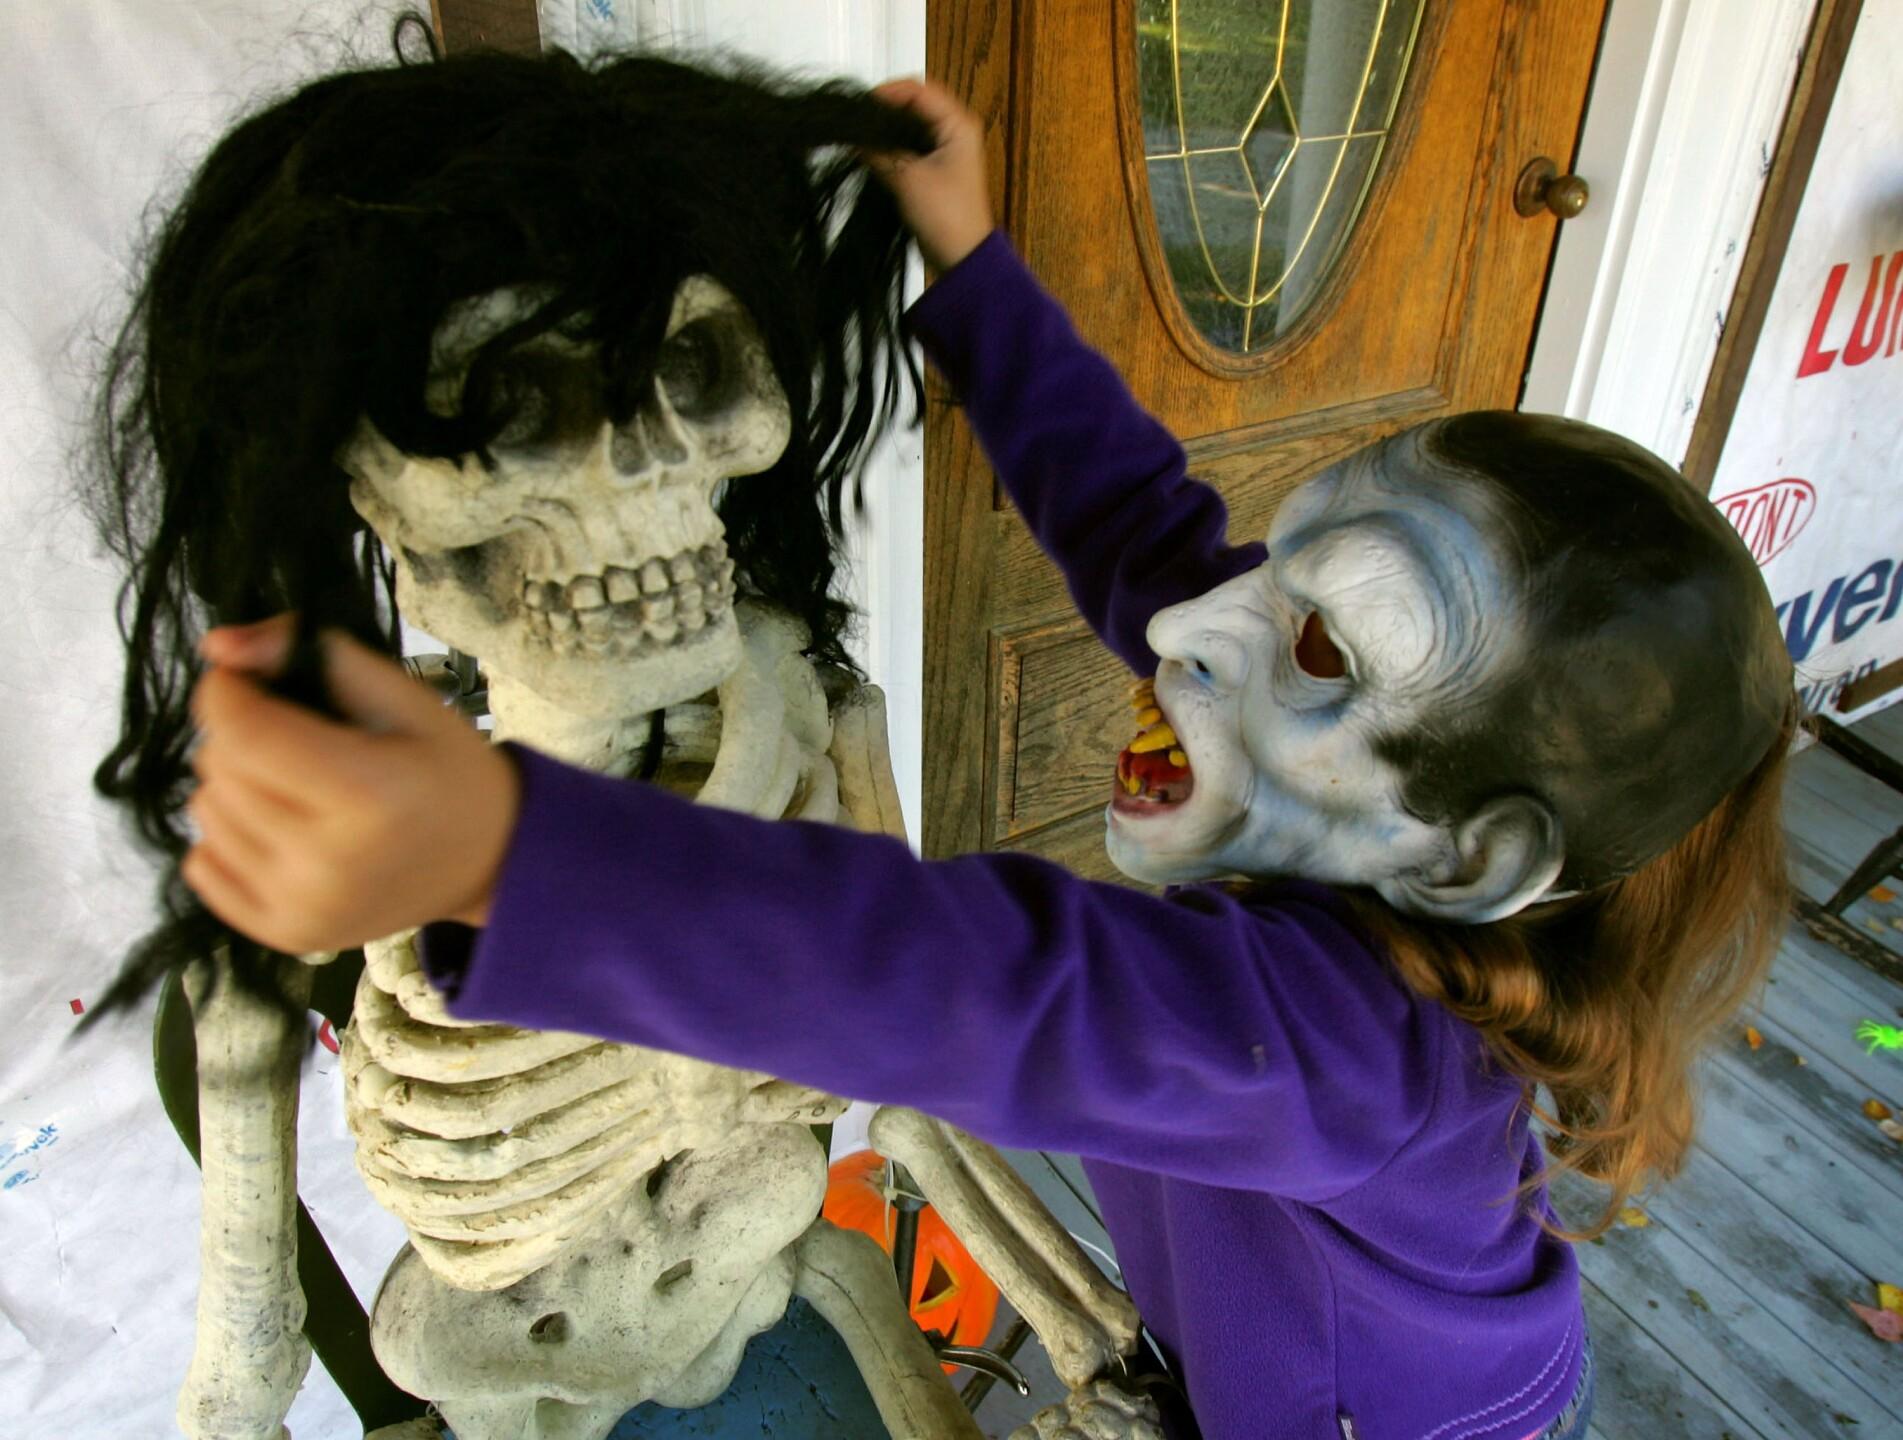 Halloween Decorations Begin Going Up